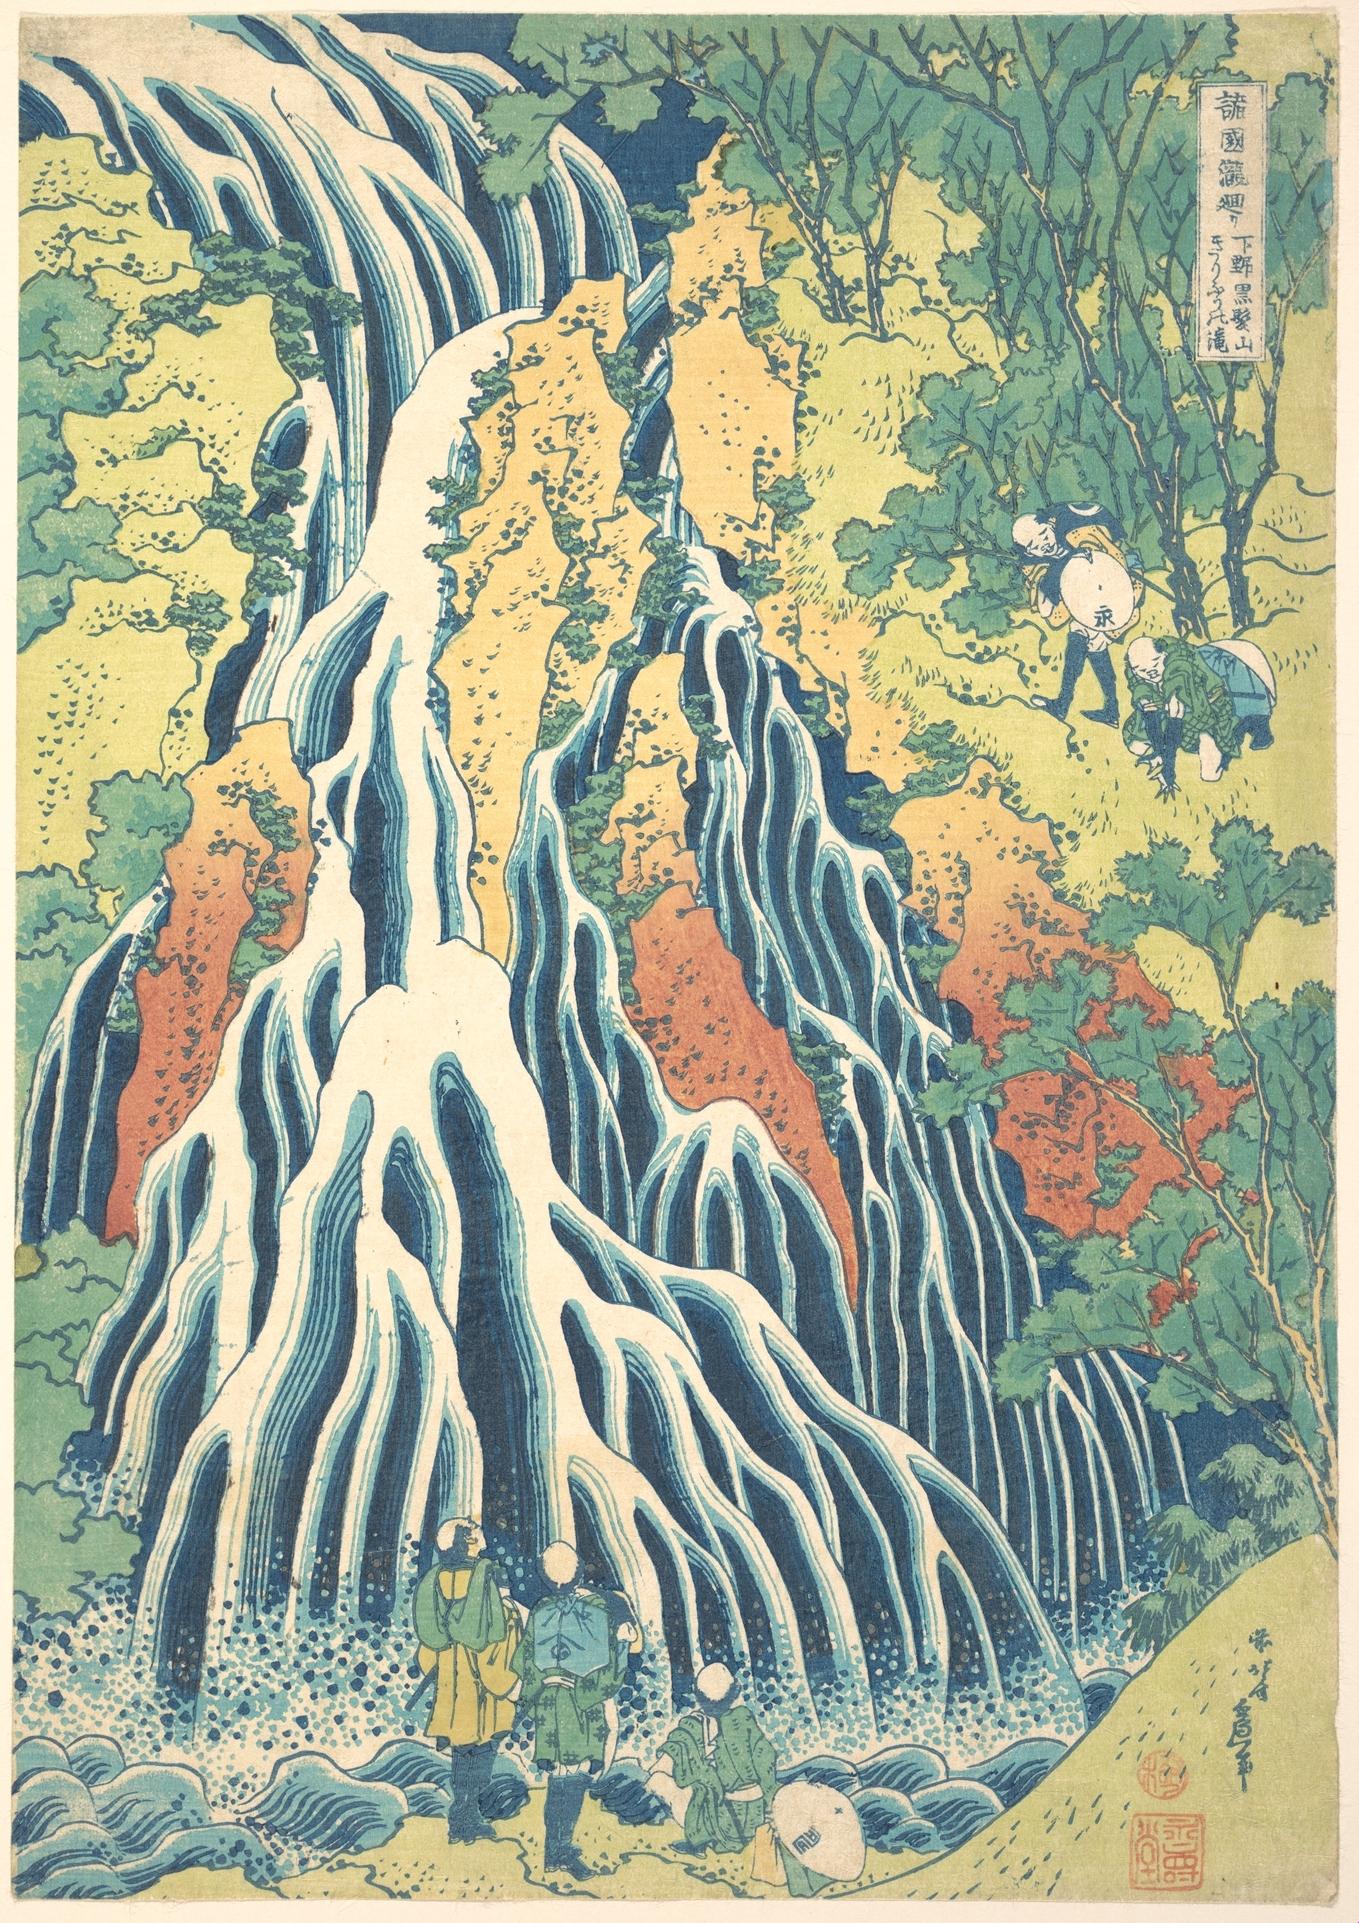 02. Japanese Woodblock Print Search